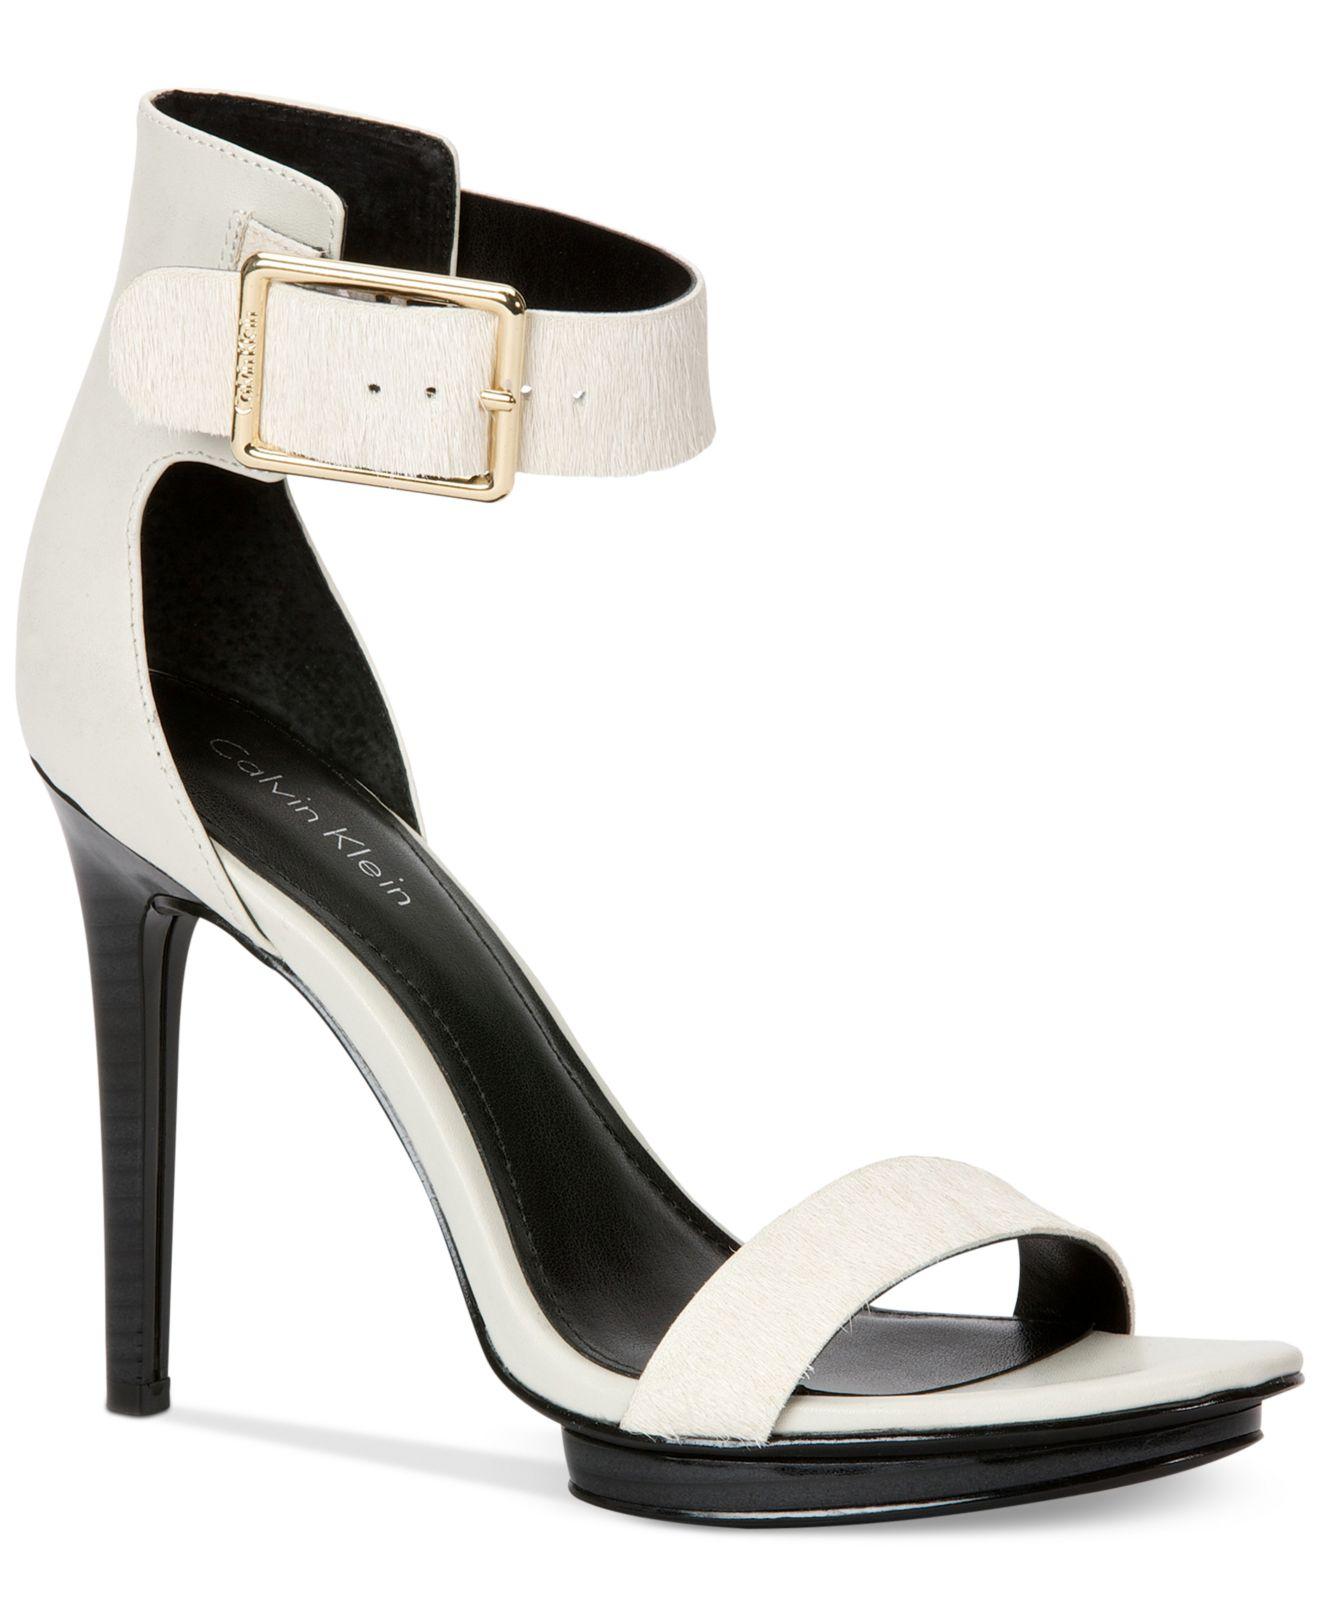 calvin klein shoes brigitte bardot